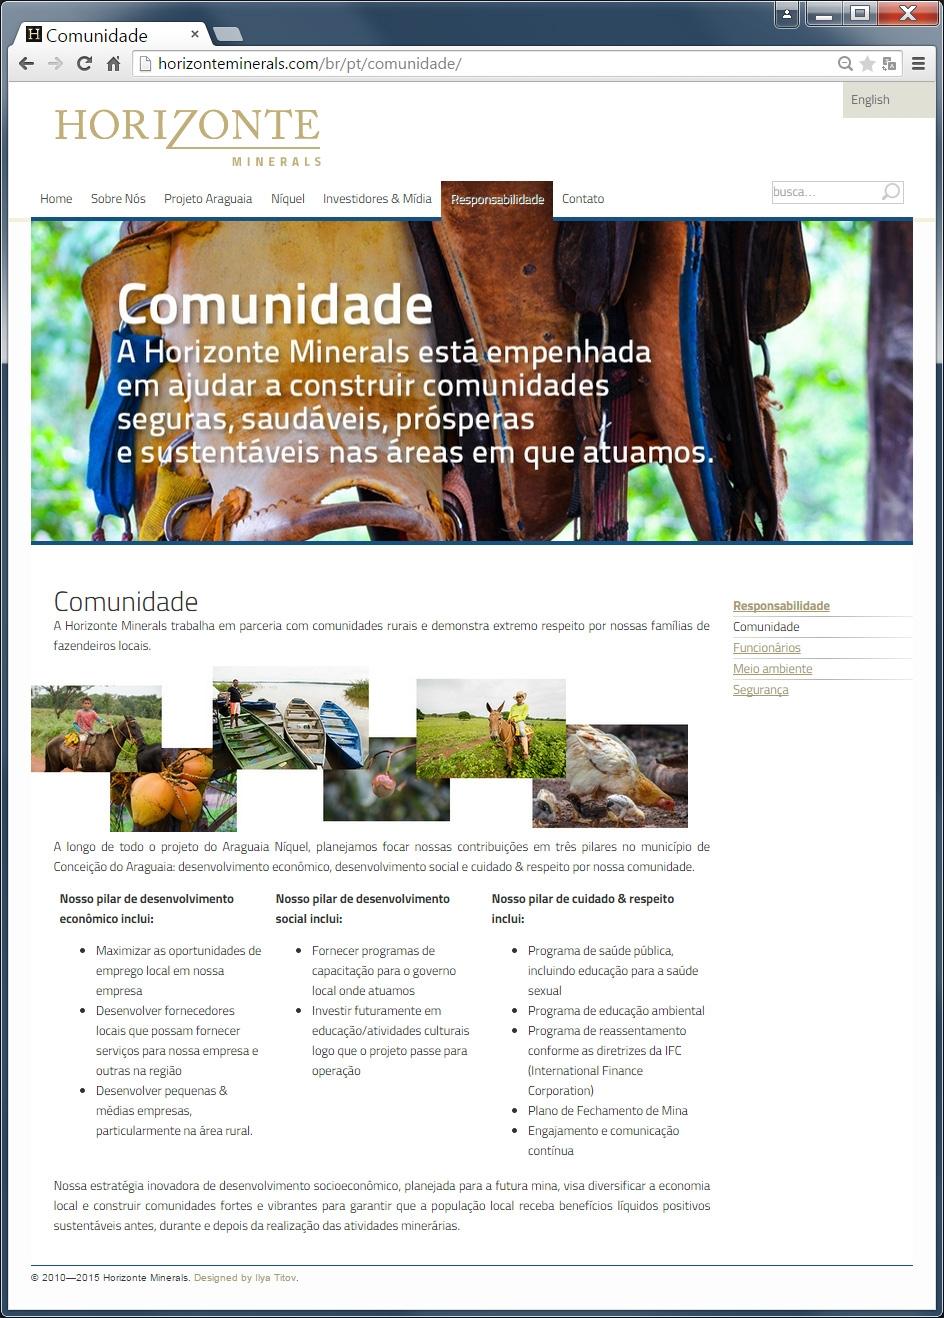 Portuguese community page